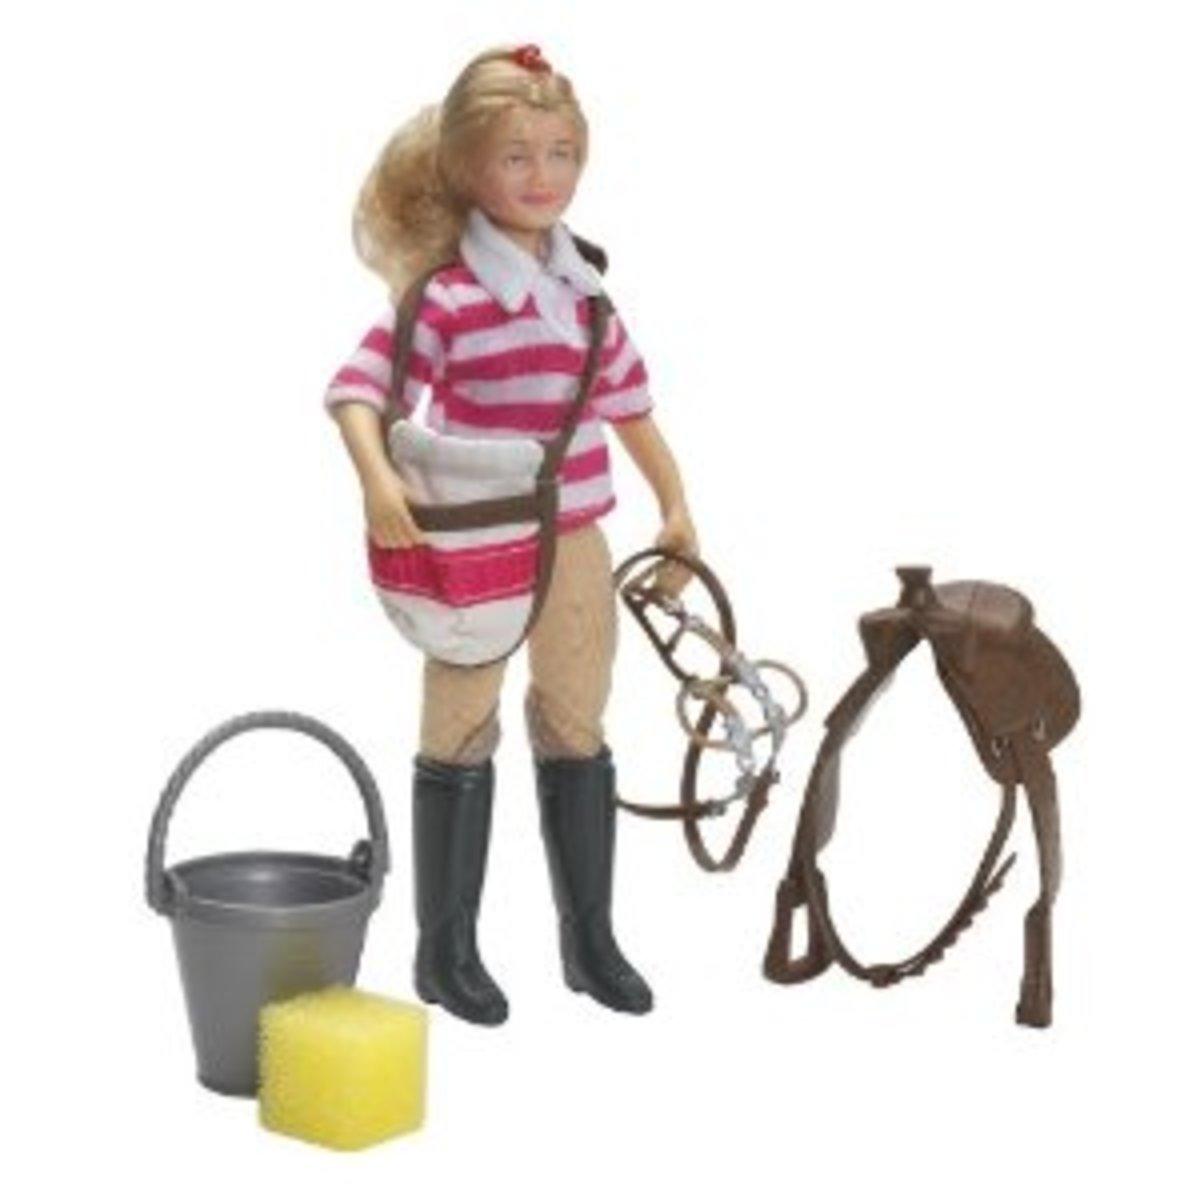 Breyer Eva Saddle Up Set - Doll and Paddock Gear